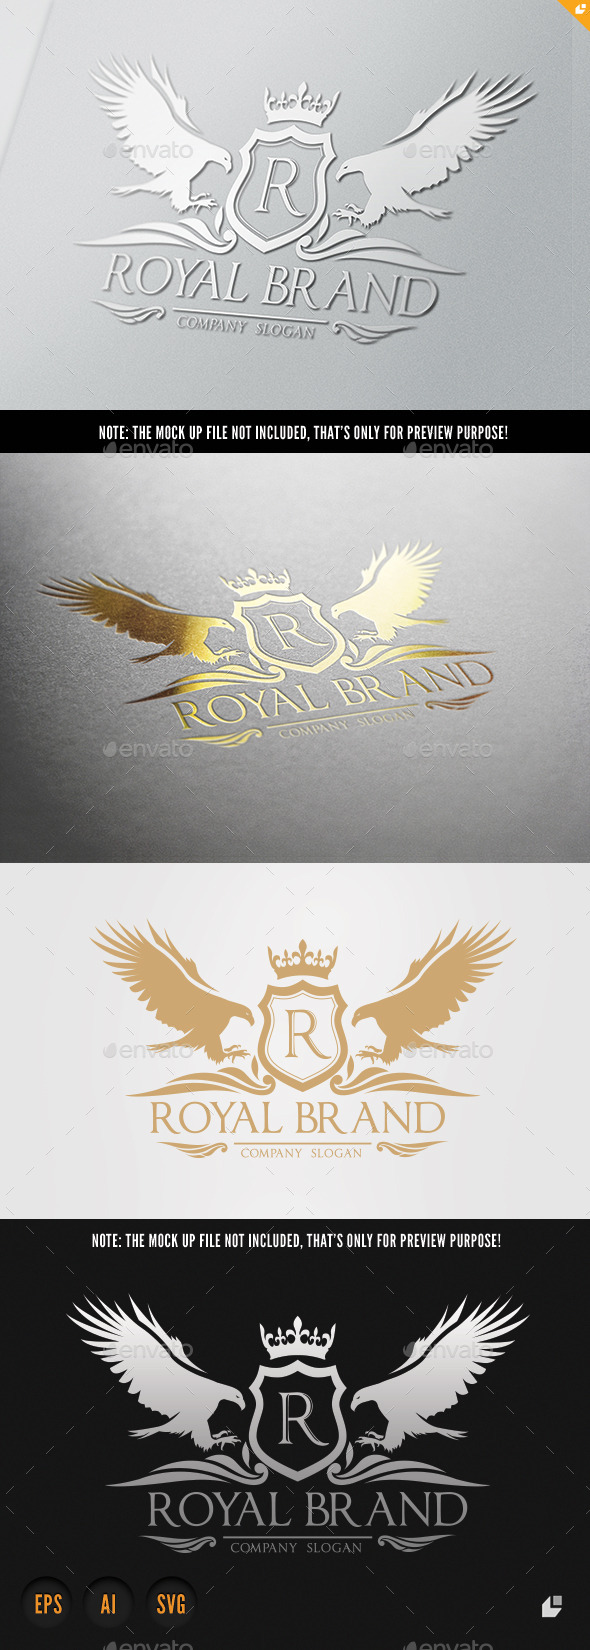 What makes a good logo  JUST Creative